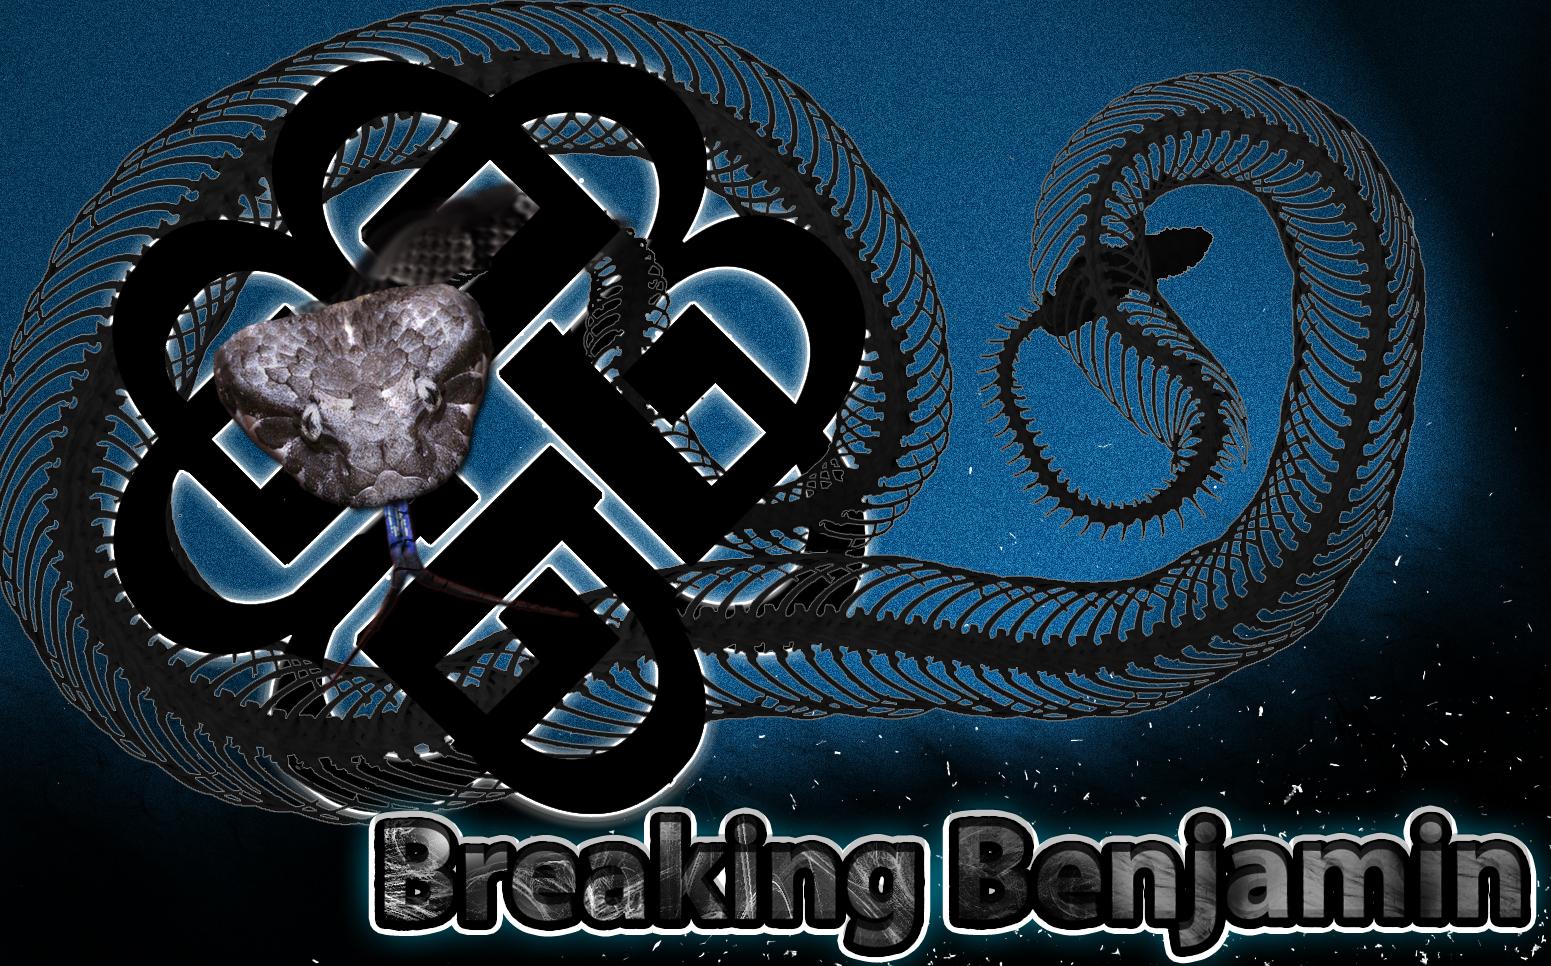 of breaking benjamin by letxxmexxdie on deviantart wallpaperhtml 1551x966